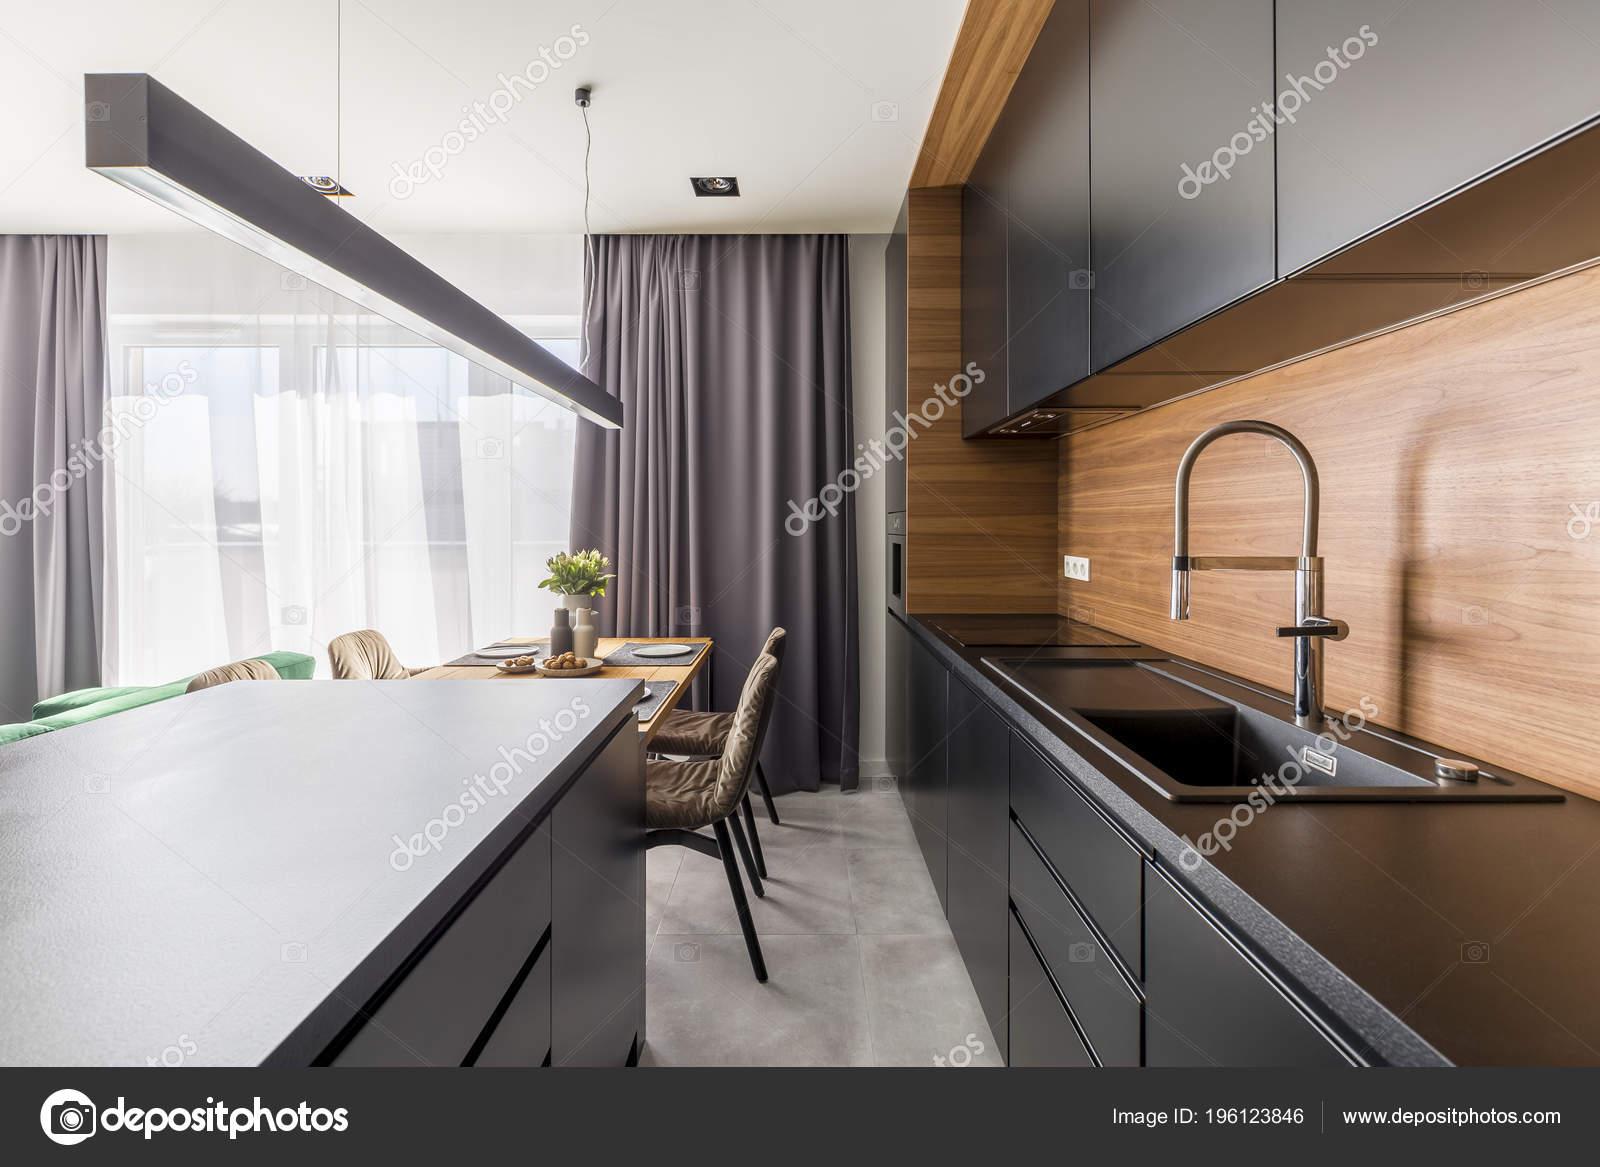 kitchen black cabinets white stools 厨房内饰用黑色橱柜钢水龙头和木桌在用餐区 图库照片 c photographee eu 图库